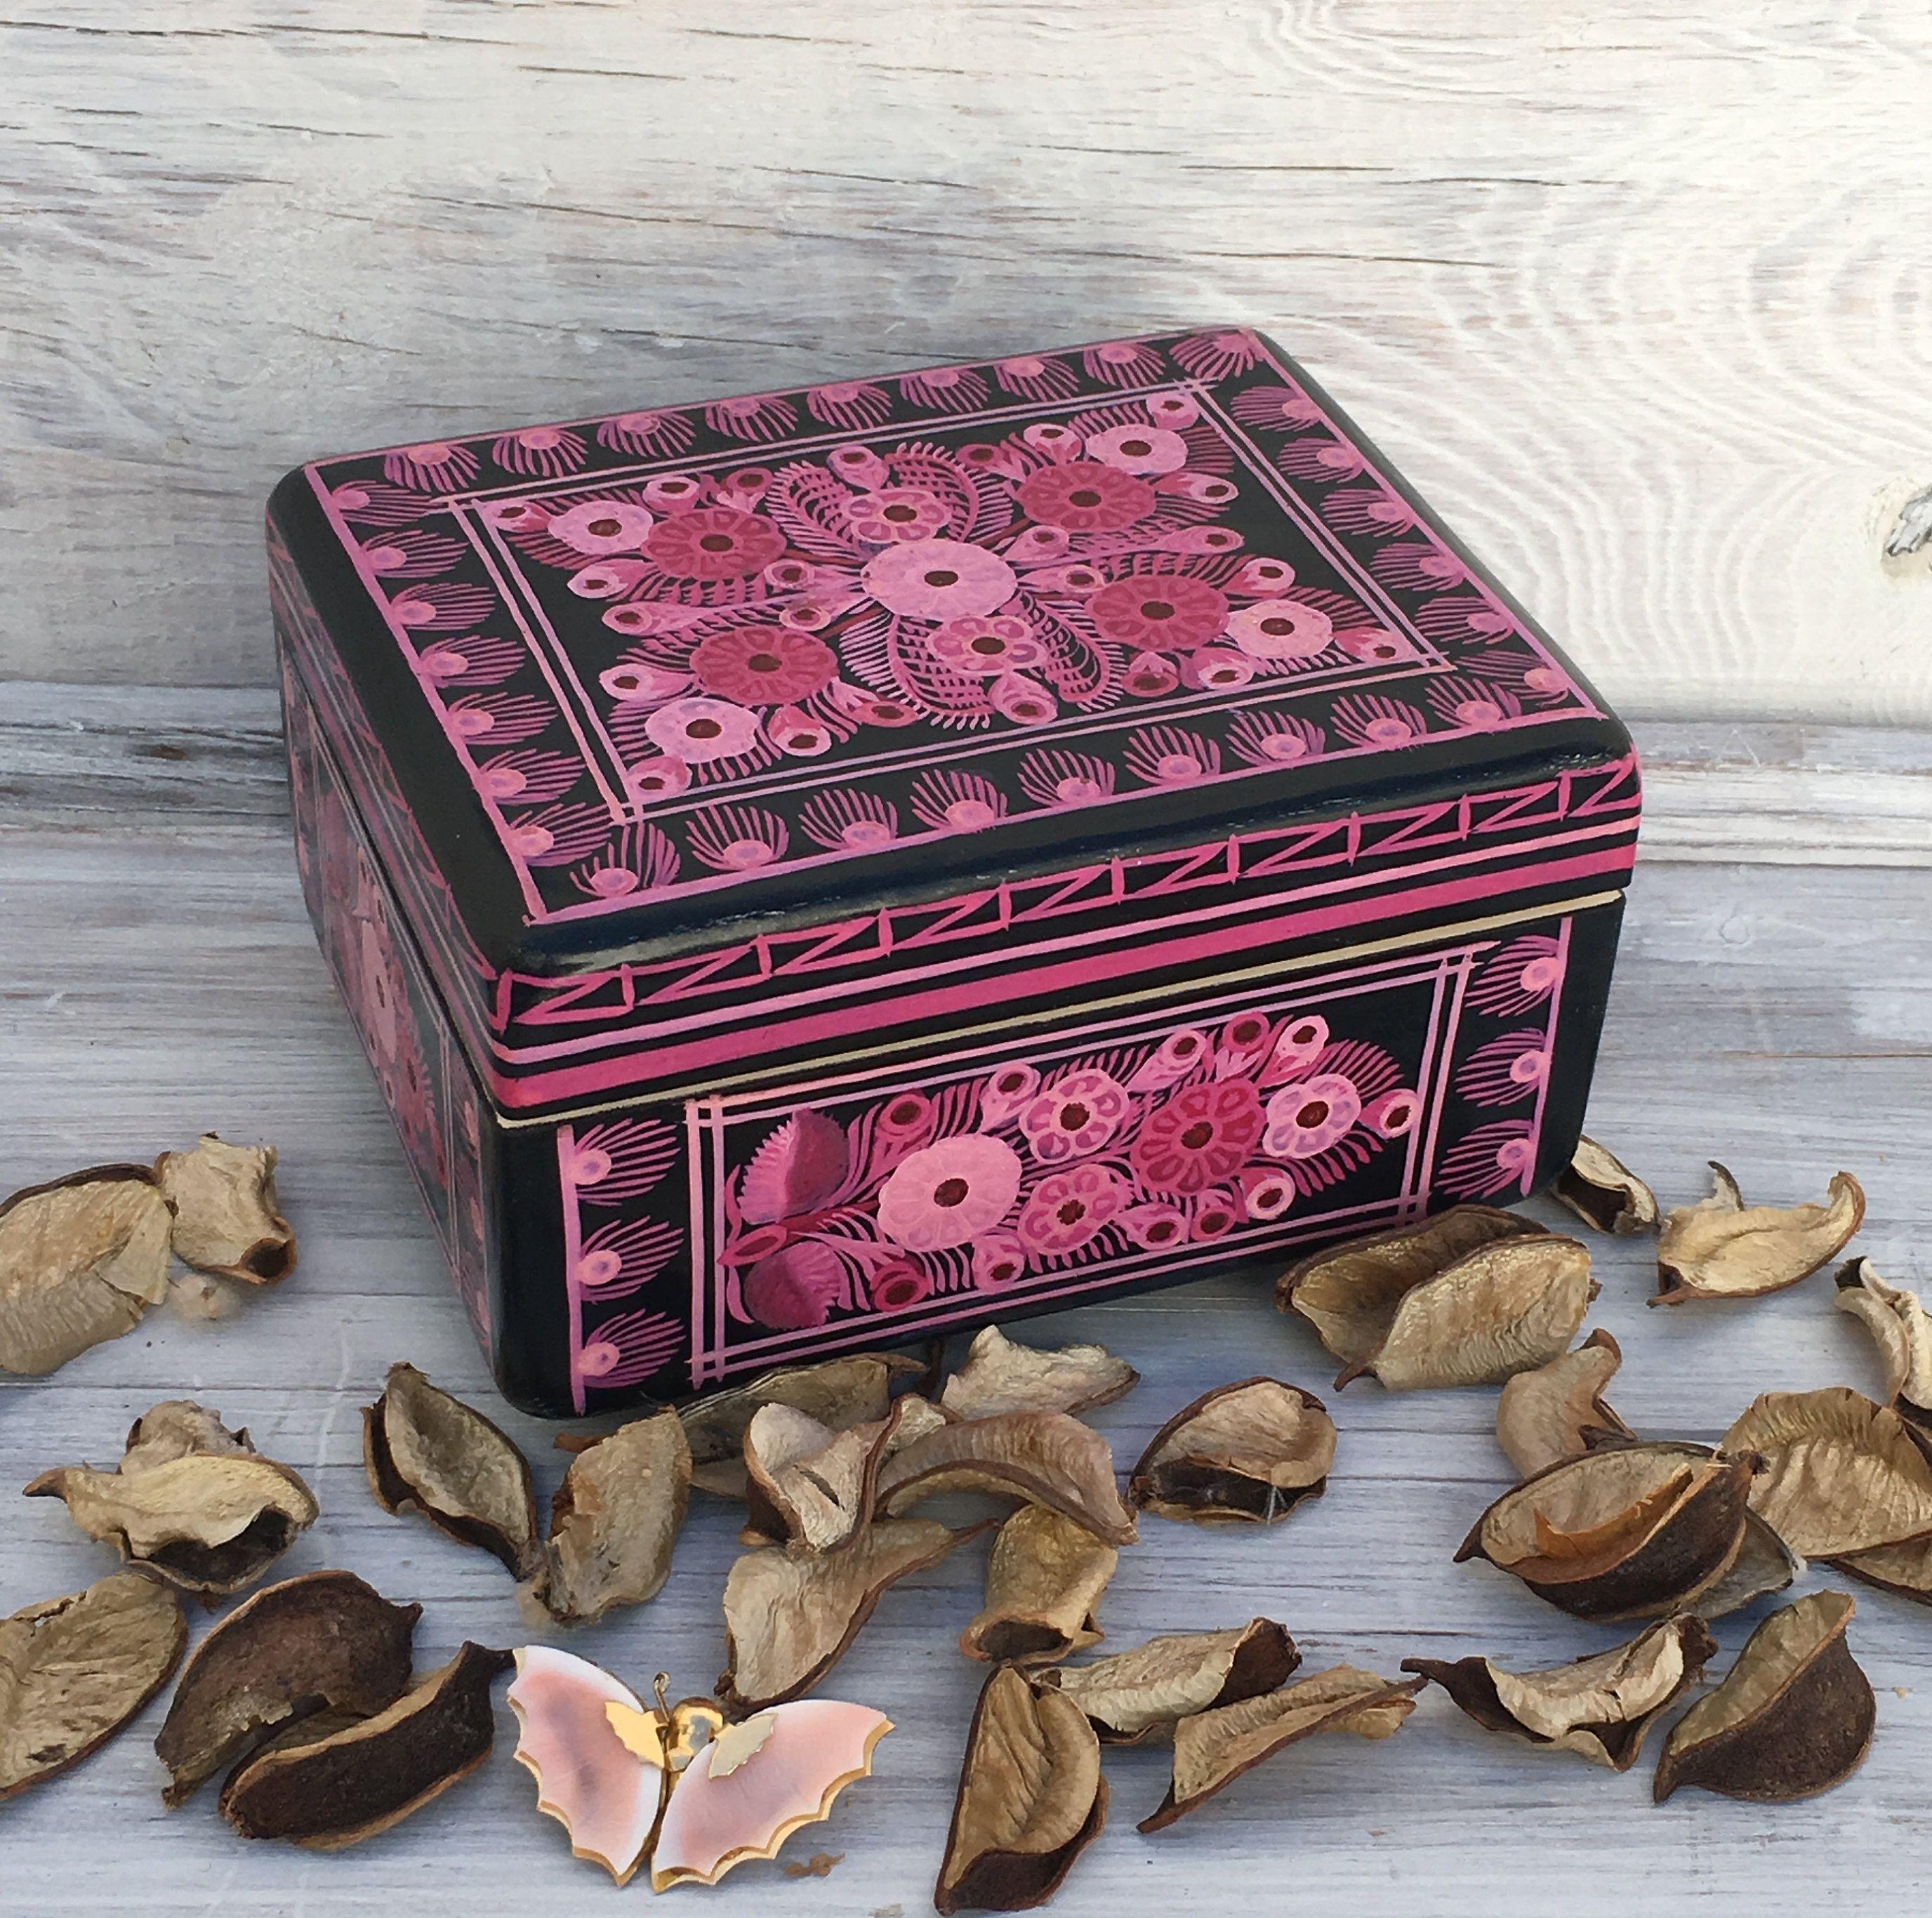 Jewelry Box Hand Painted Olinala Box Wooden Box Keepsake Box Jewellery Box Jewelry Storage Wood Box Jewelry Or Box Hand Wooden Jewelry Boxes Jewellery Storage